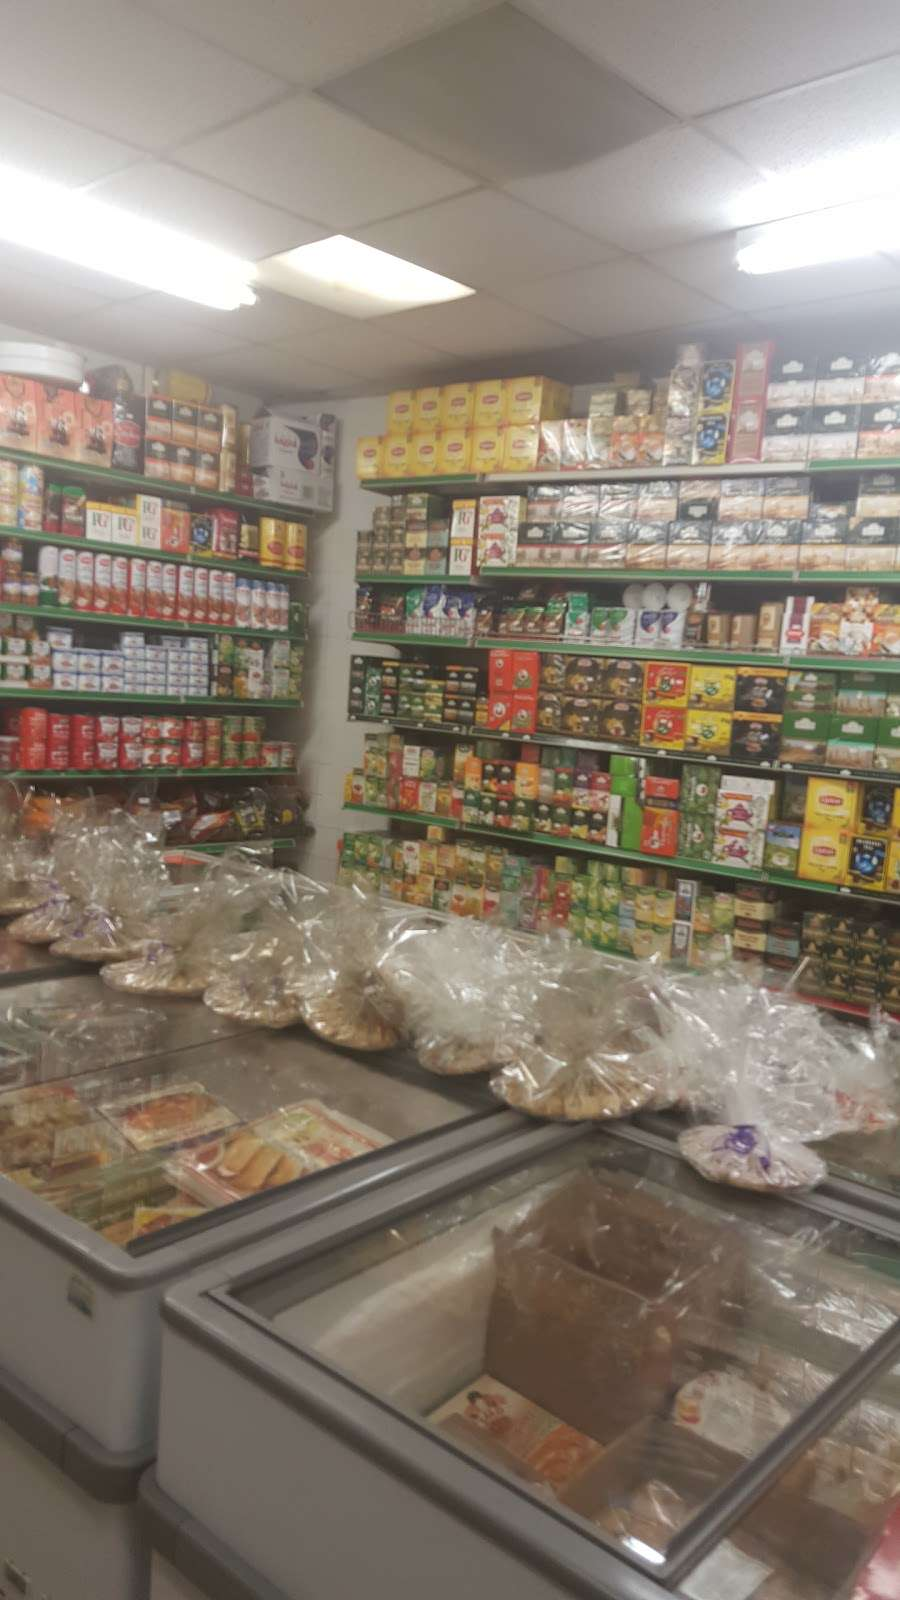 Suroor Market - supermarket    Photo 9 of 10   Address: 101 Robin Hood Way, Roehampton, London SW15 3QE, UK   Phone: 020 8974 6088